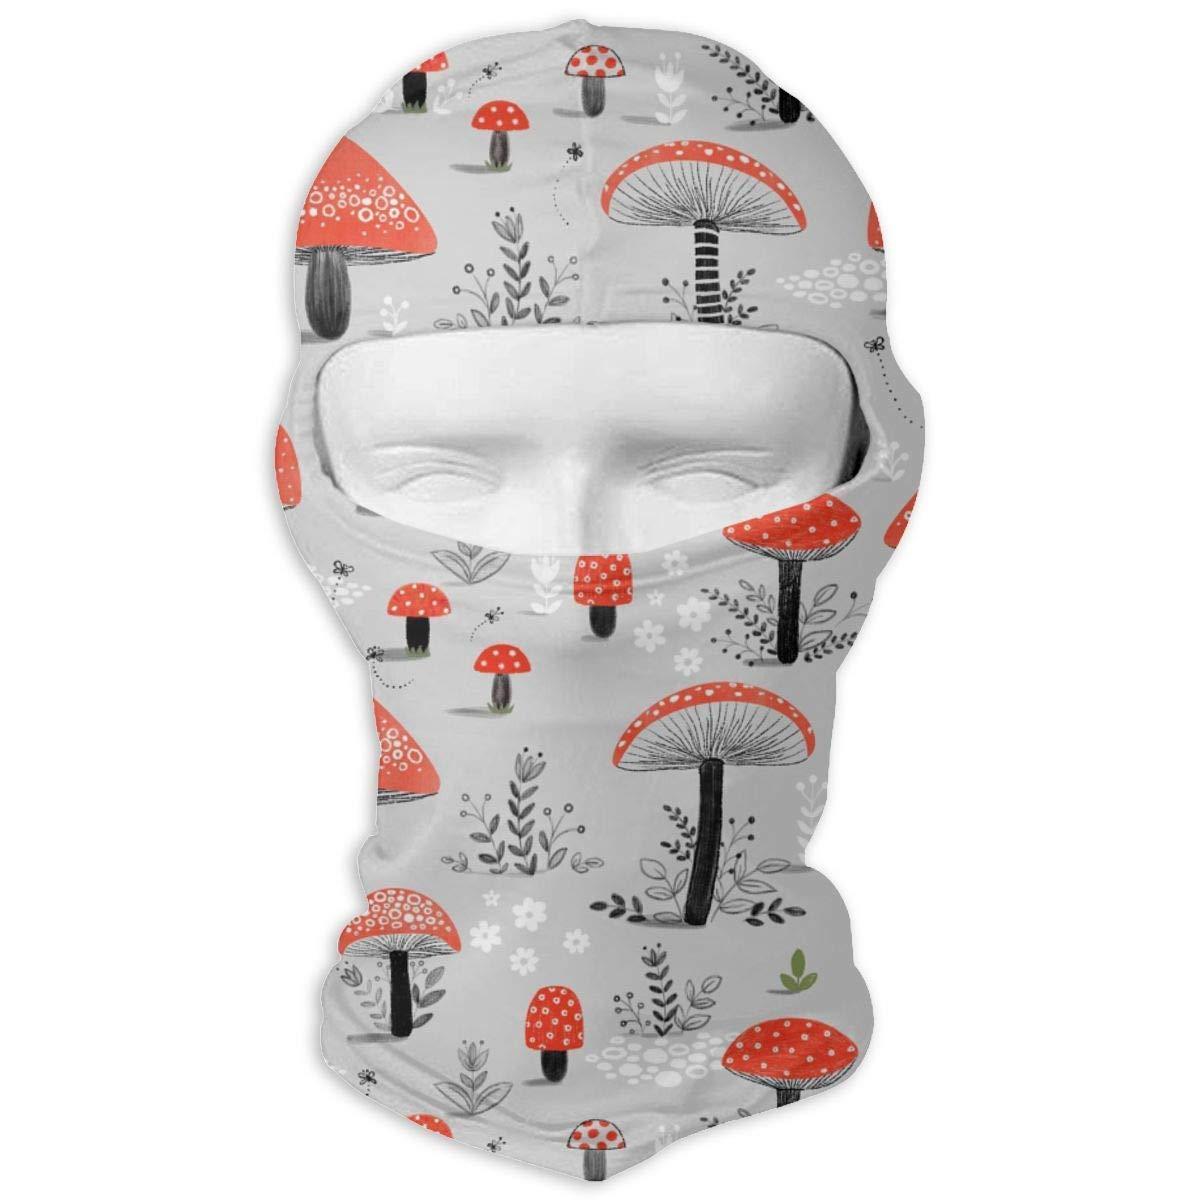 LJBBJL1 Mushroom Plants Balaclava Face Mask Hood Outdoor Sport Hat for Ski,Cycling,Motorcycling,Climbing